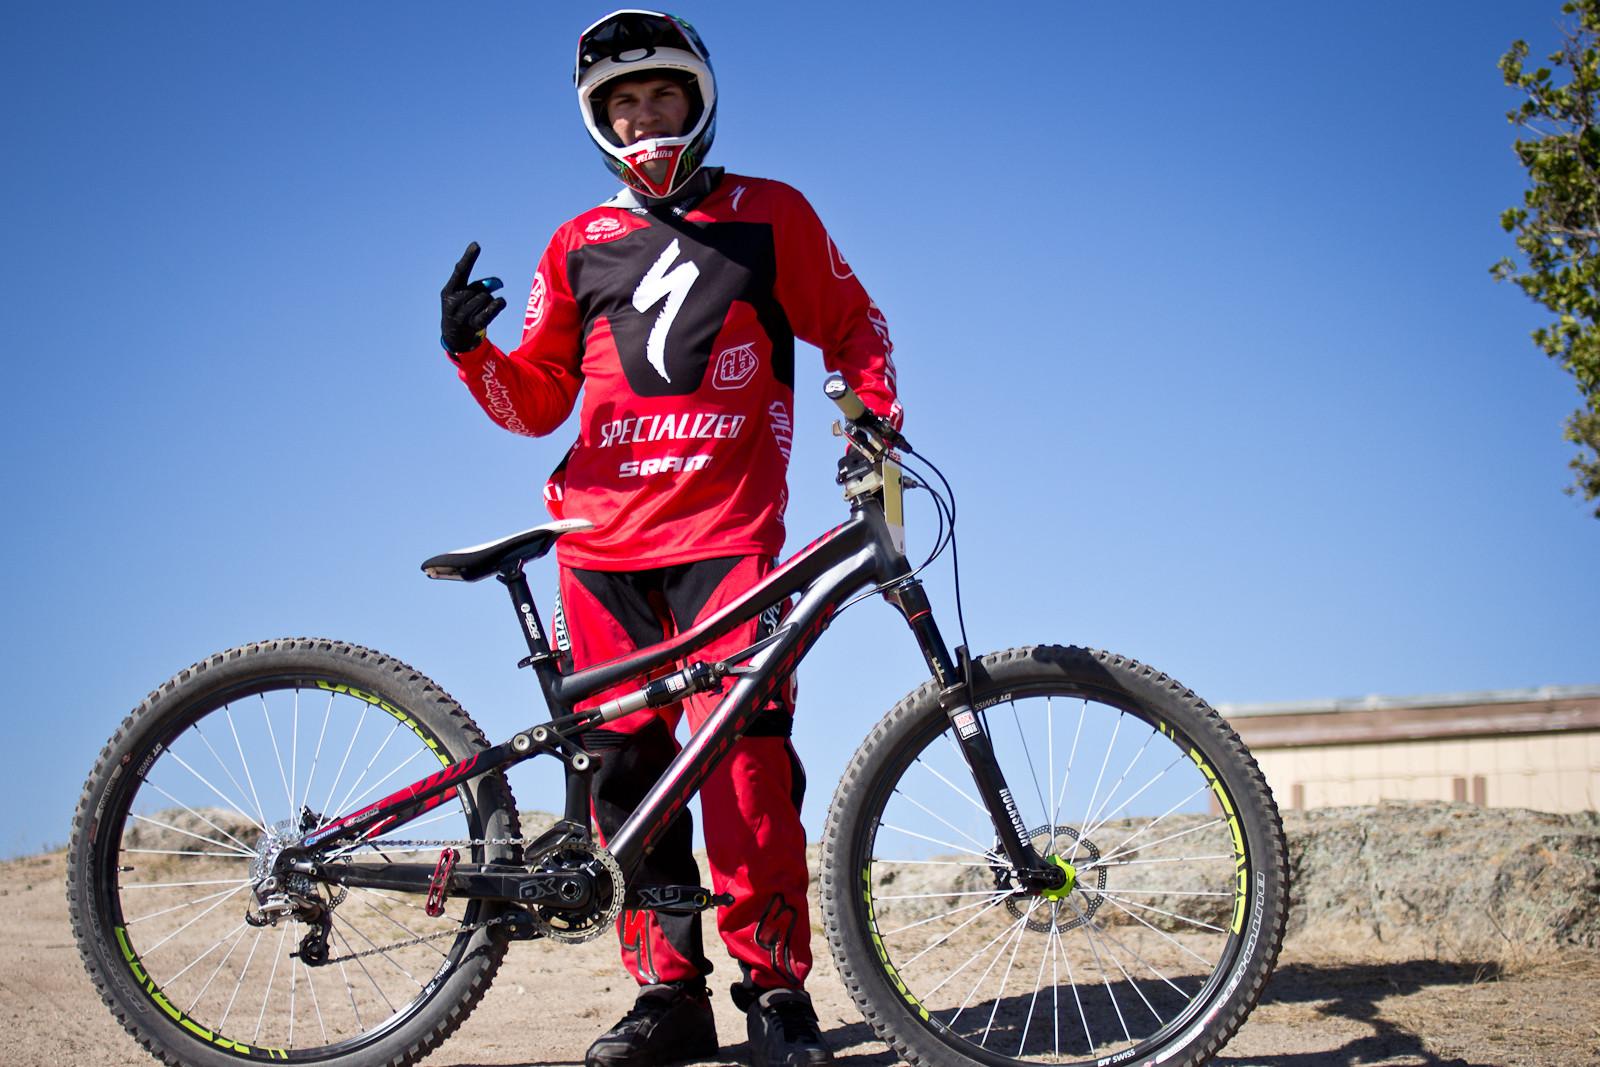 Mitc Ropelato's 2014 Specialized Enduro SX Slalom Bike - 2013 Sea Otter Pro Slalom Bikes - Mountain Biking Pictures - Vital MTB